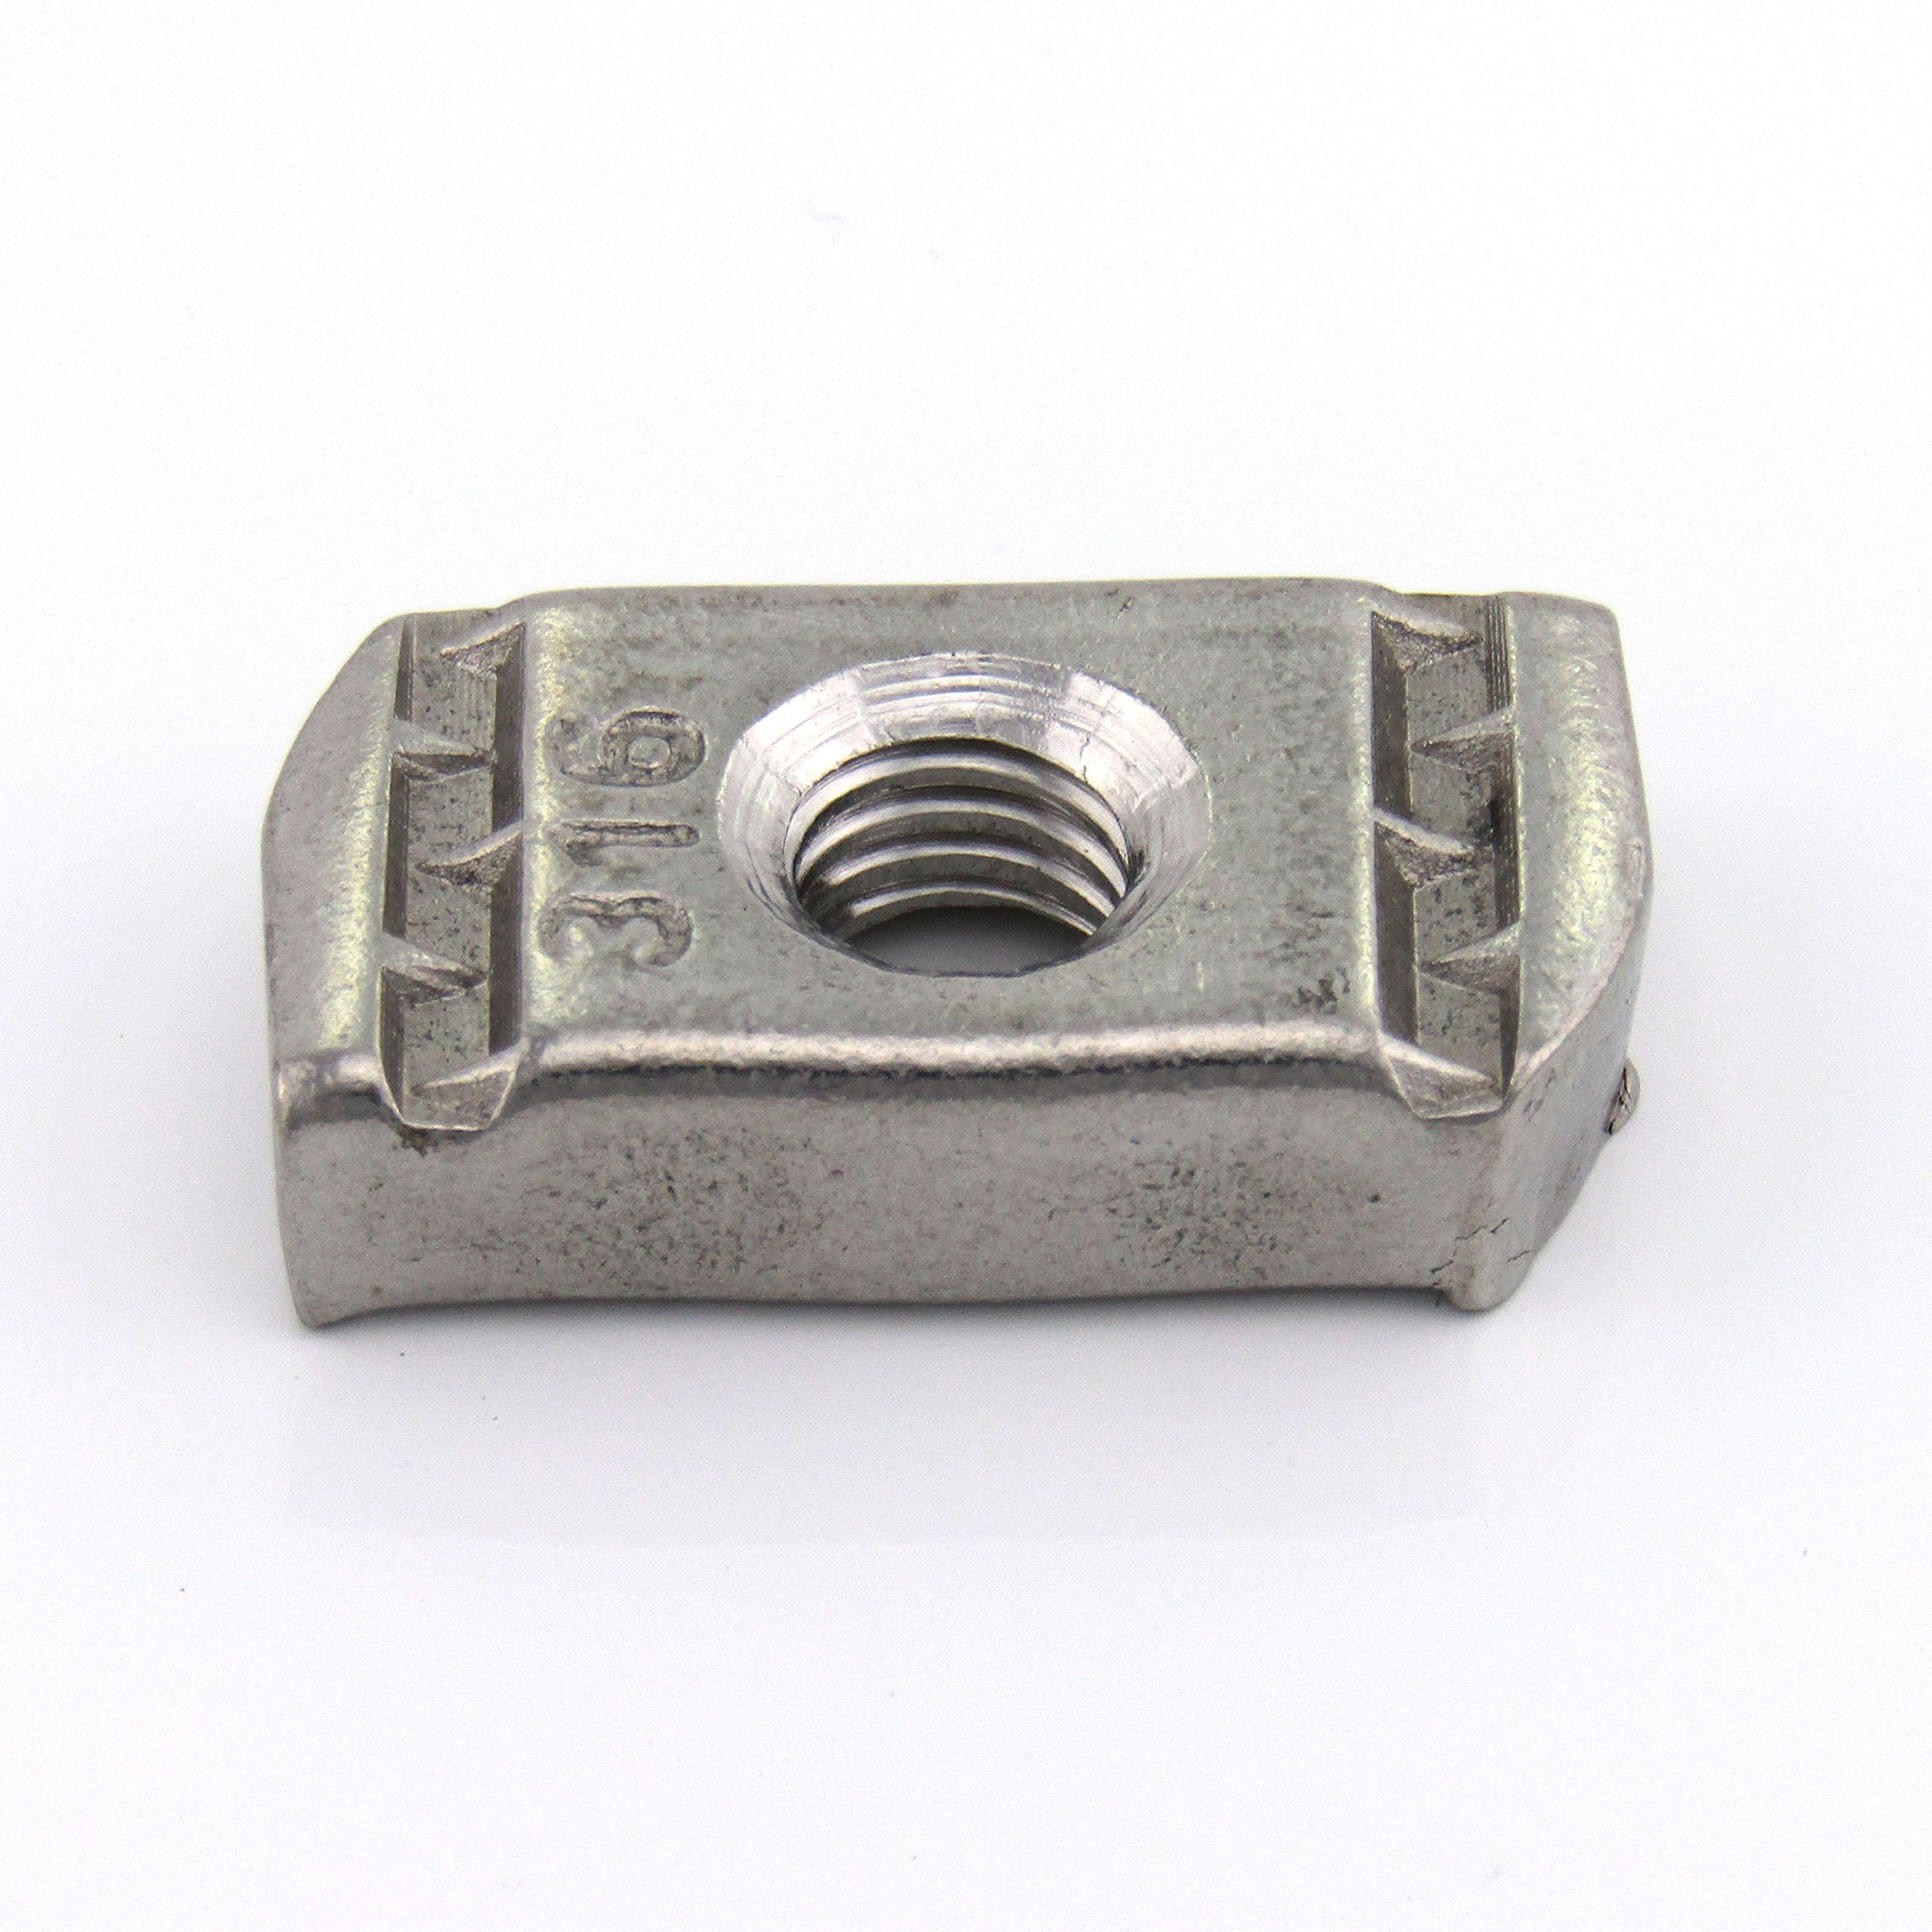 3/8-16X3/8 Thick, No Spring Nut, S/S (100 per Box) by ARWS